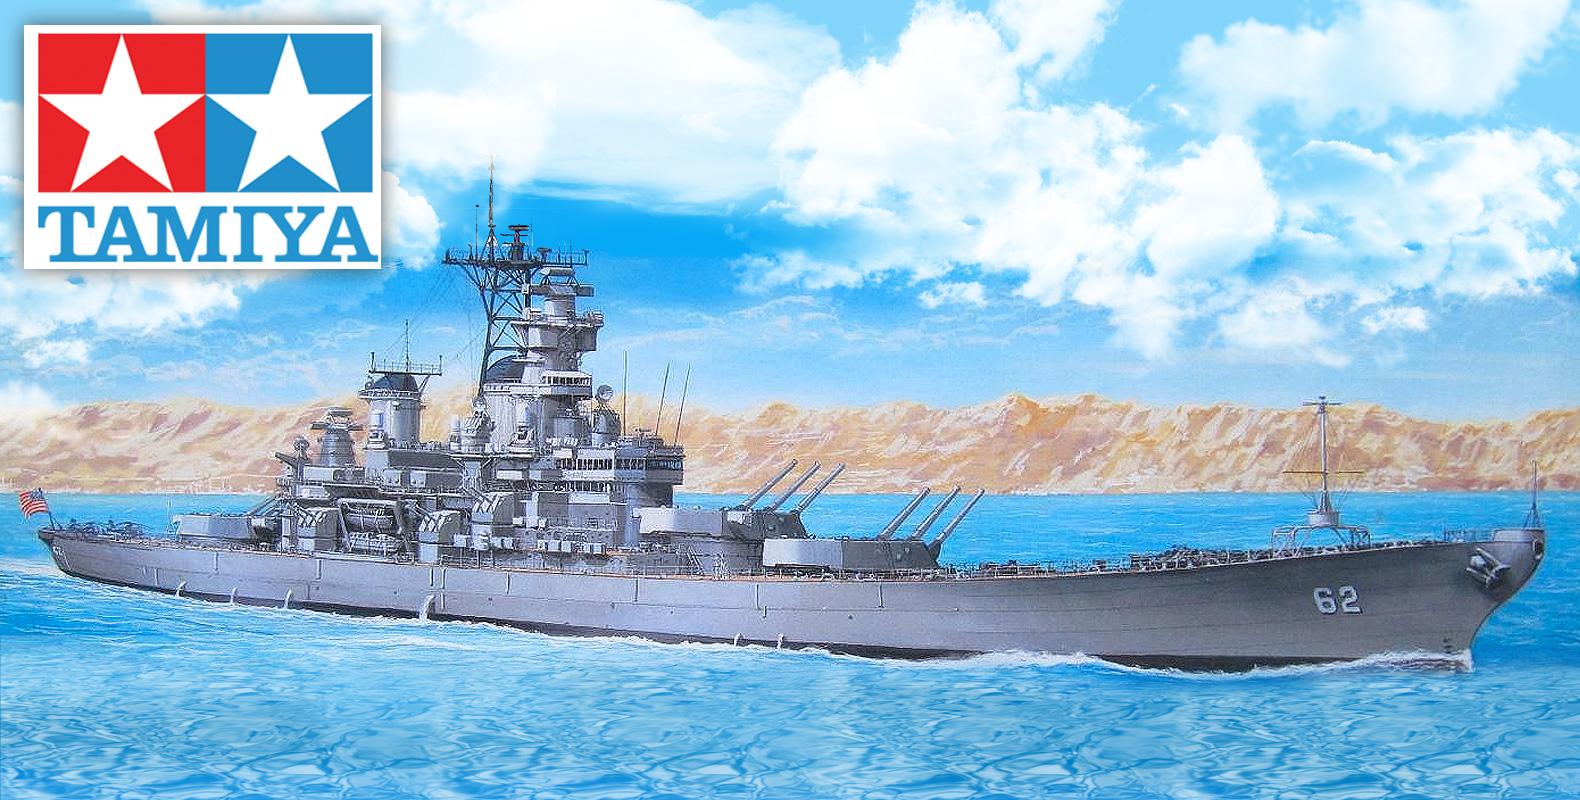 Tamiya model ship kits 10.18.20